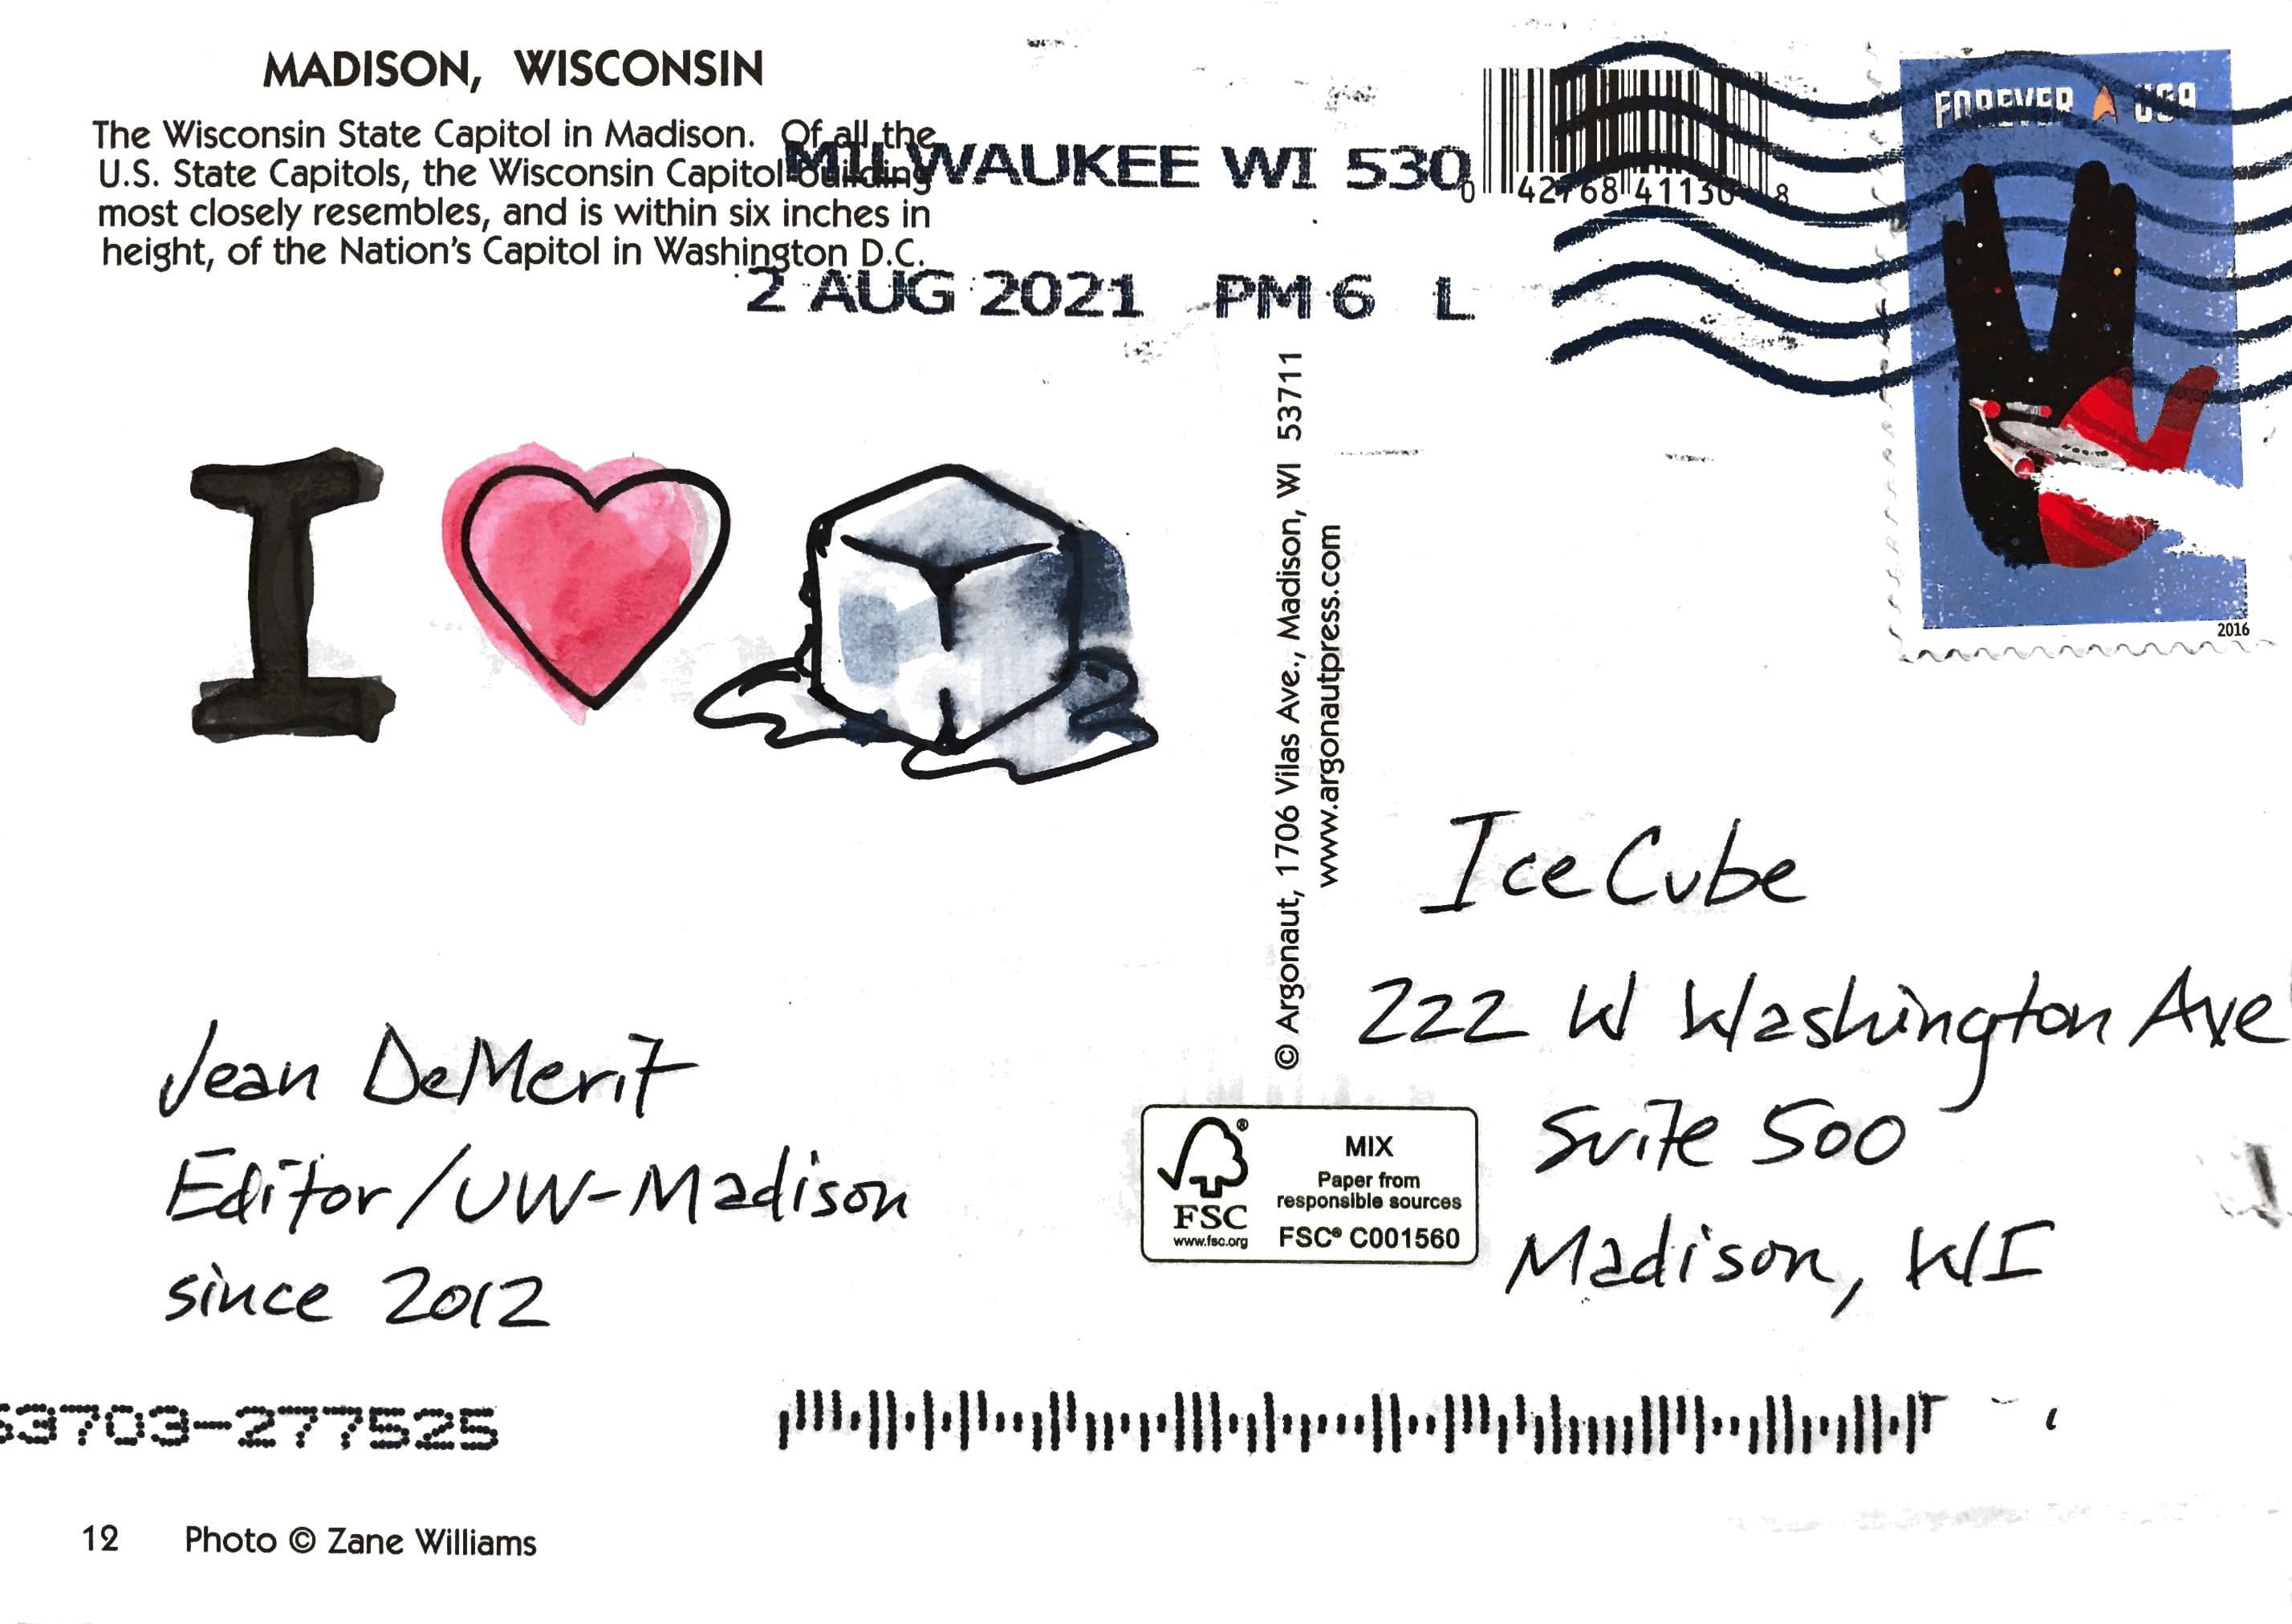 I 💗🧊 [I heart ice cube] Jean DeMerit Editor/UW–Madison Since 2012